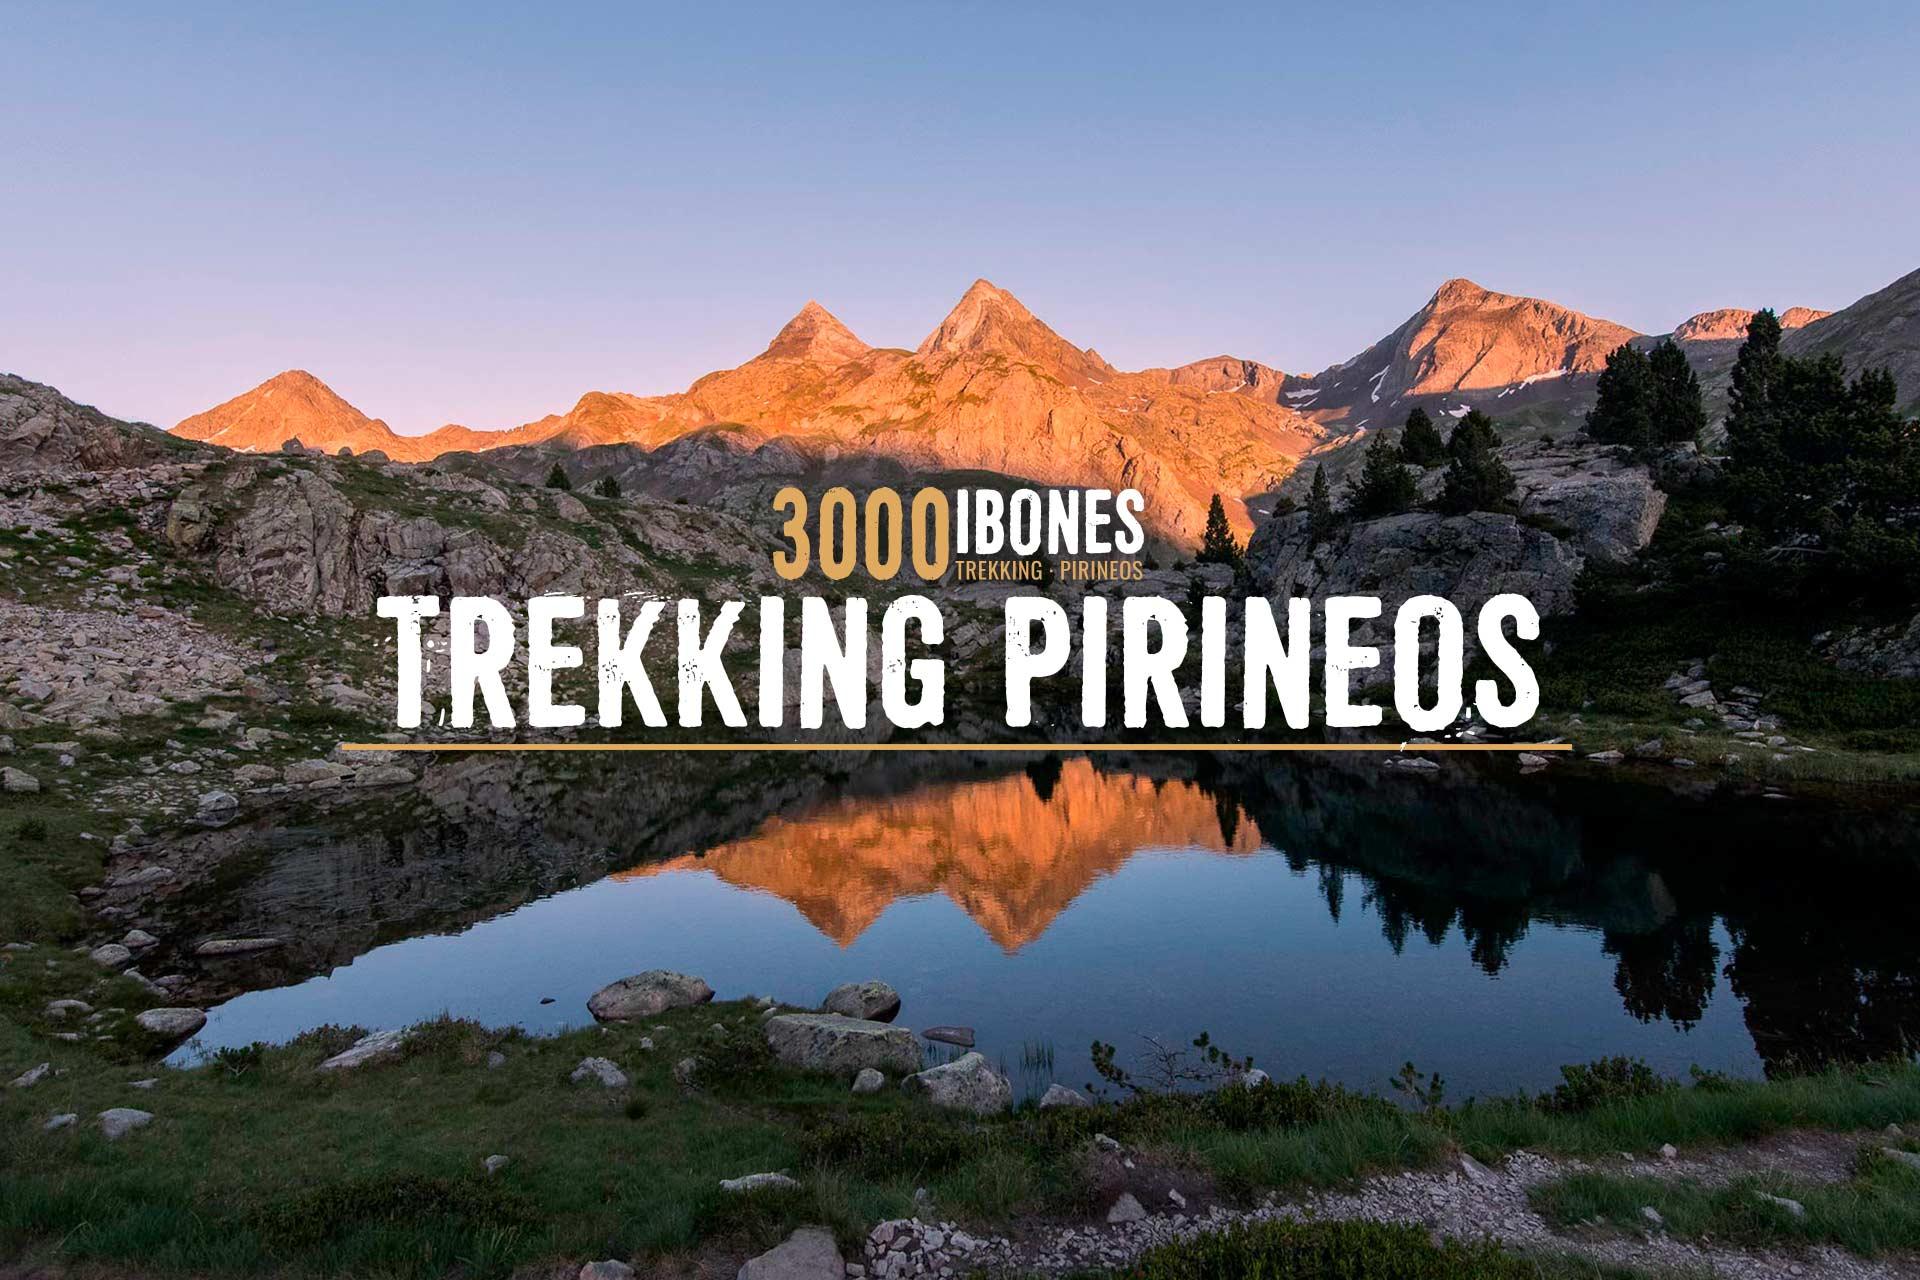 3000 IBONES - TREKKING PIRINEOS